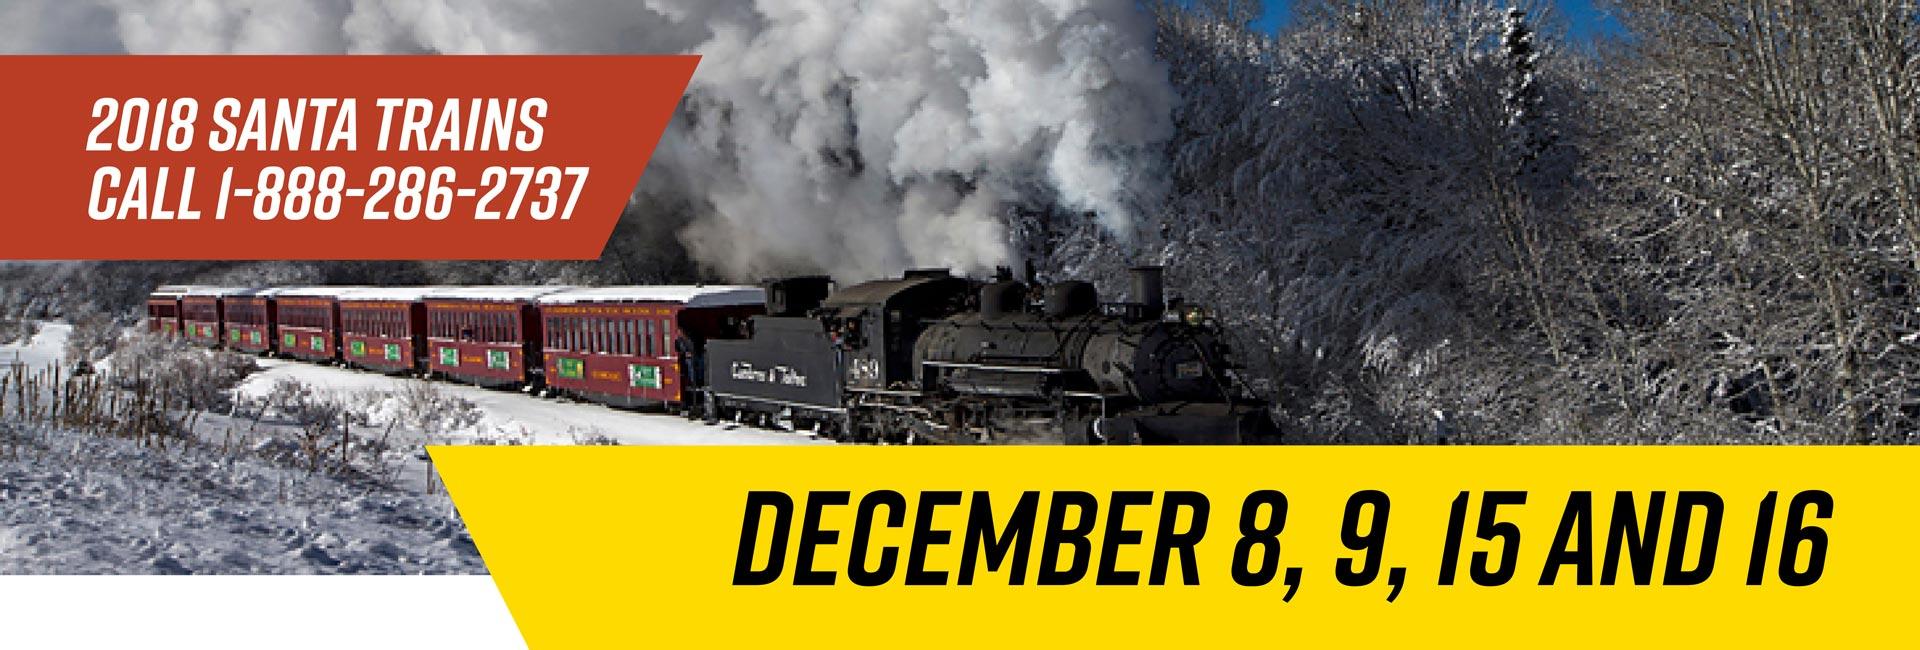 2018 Santa Train Slider